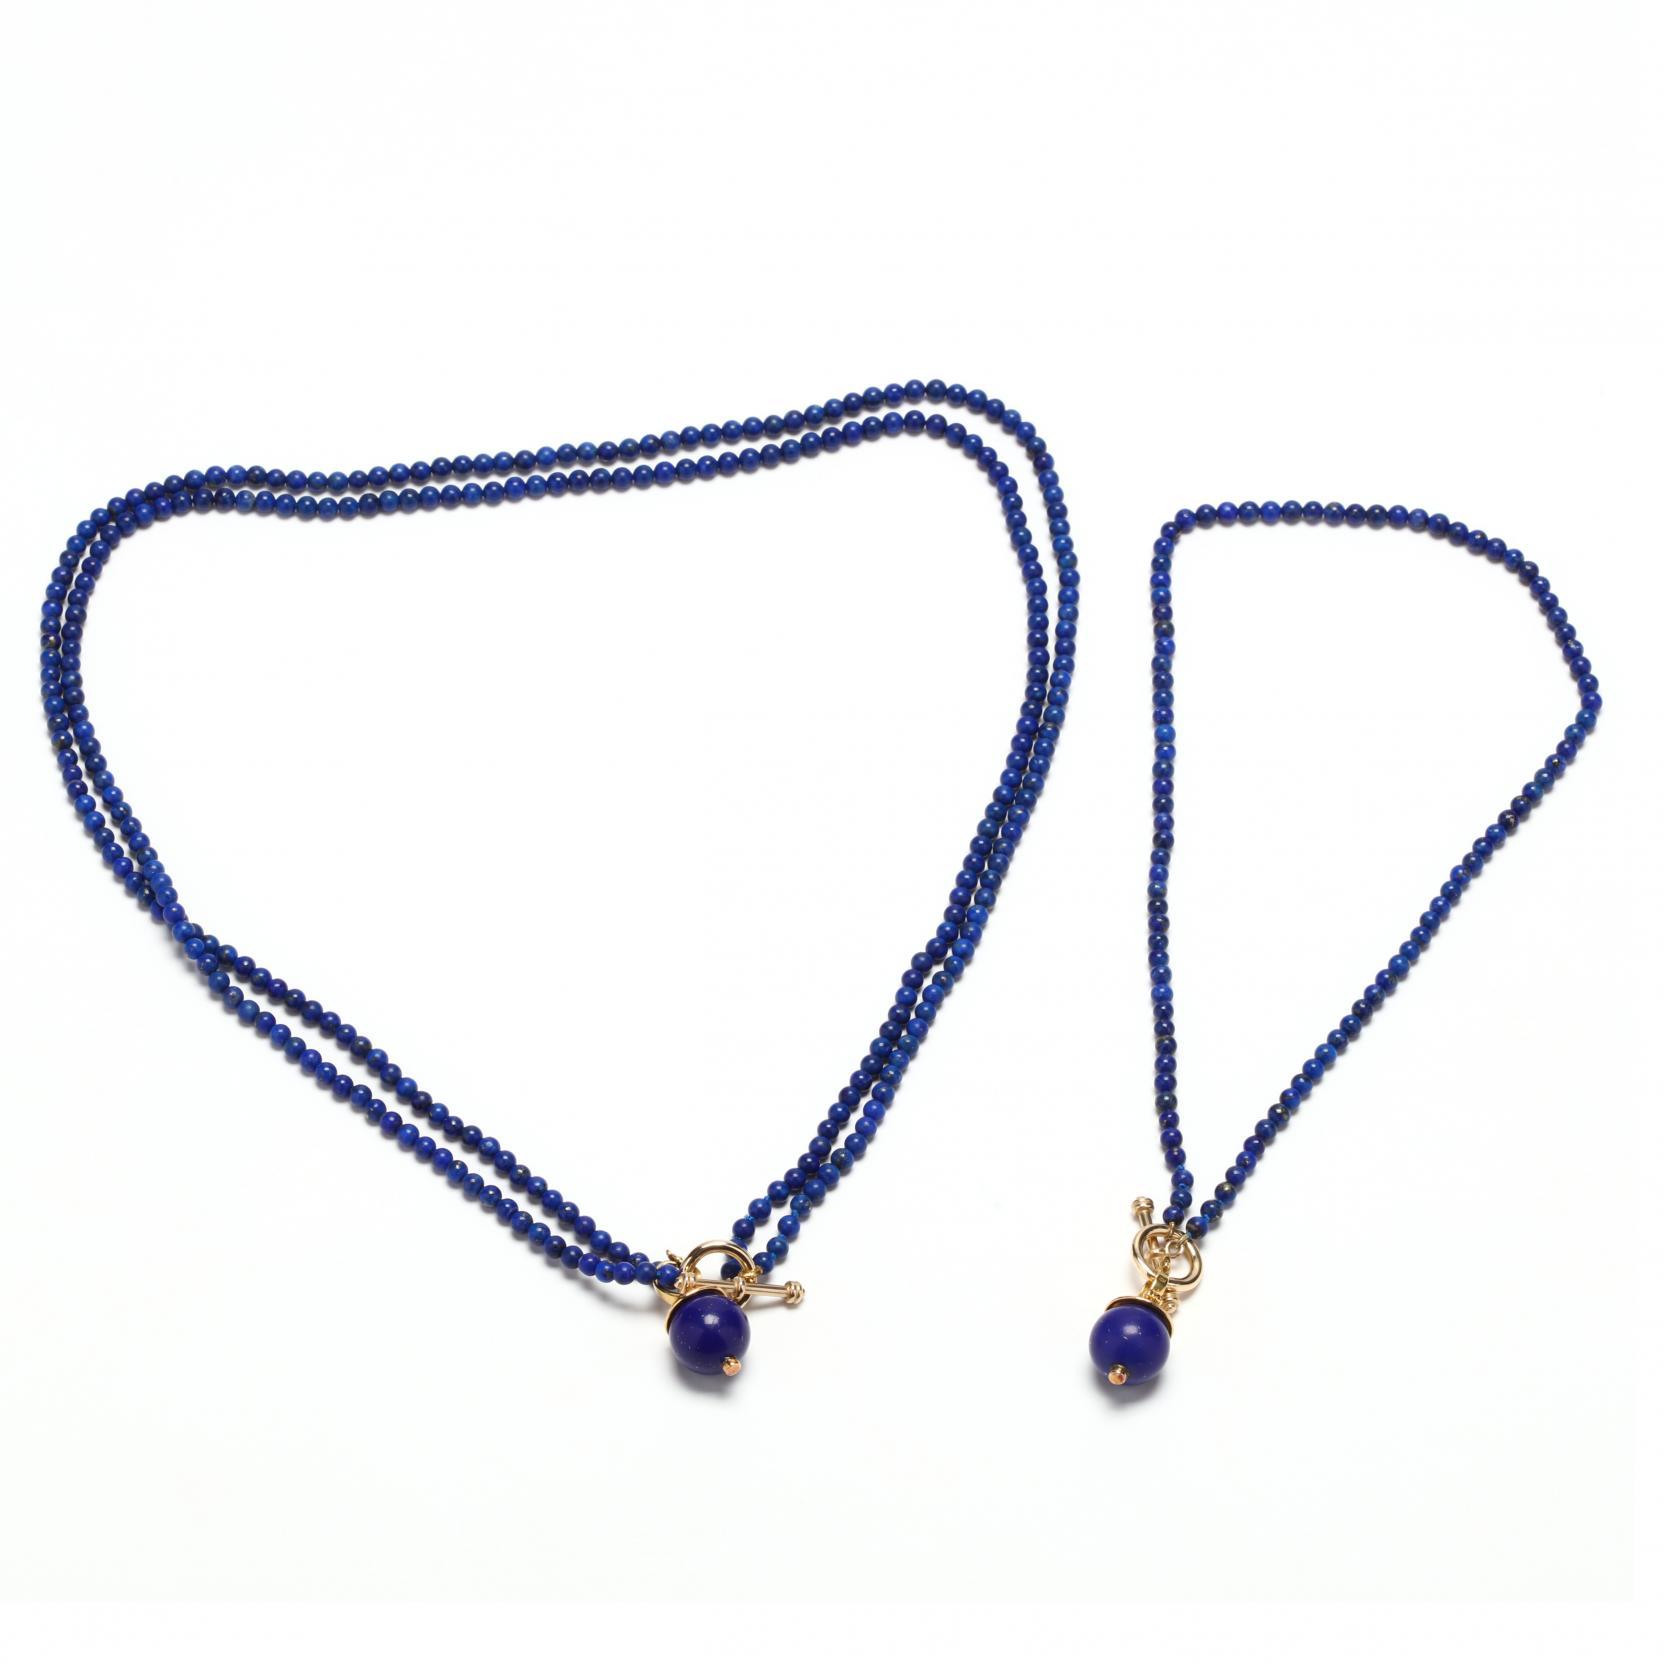 two-14kt-lapis-bead-necklaces-with-18kt-gold-lapis-pendants